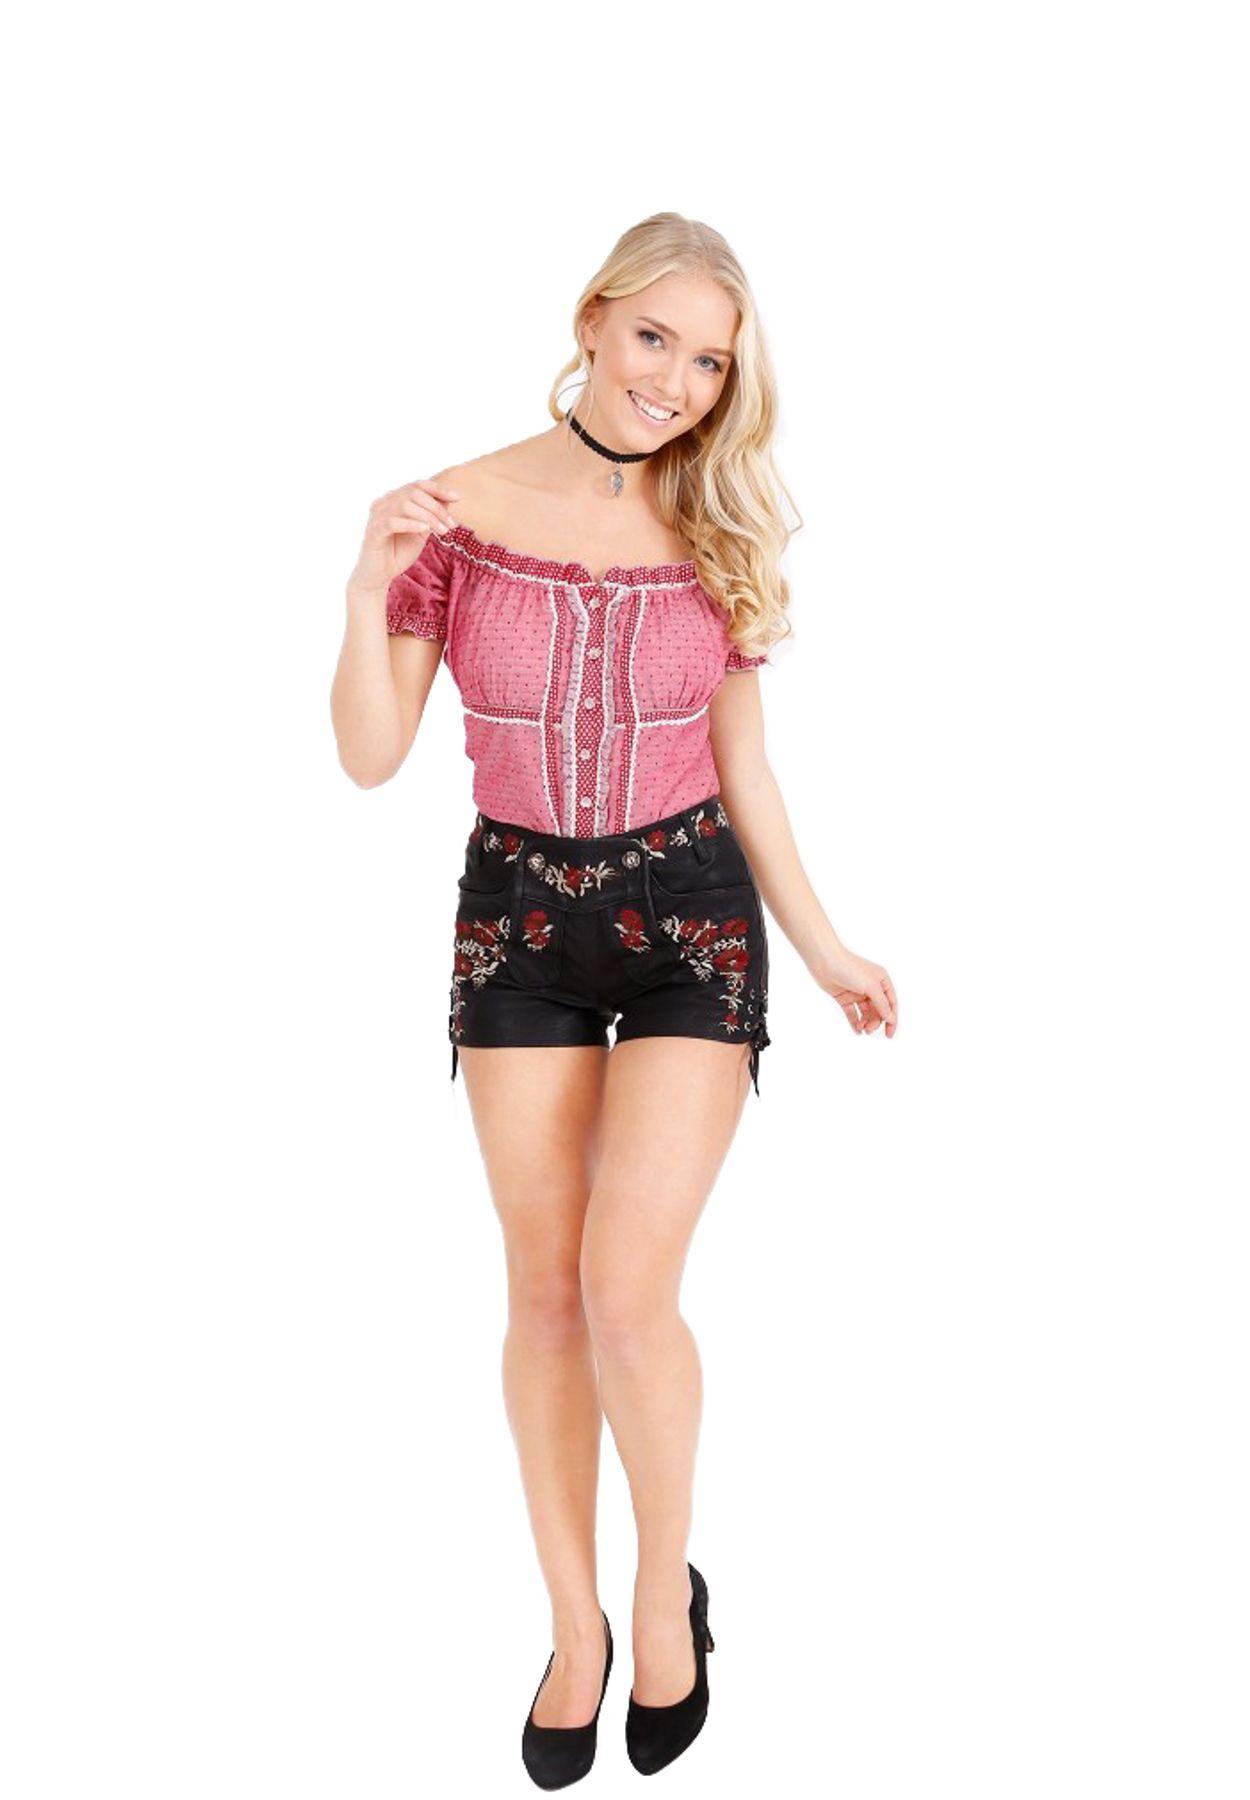 Krüger - Damen Trachtenhose in schwarz/rot, Black Rose (35395-4) – Bild 1